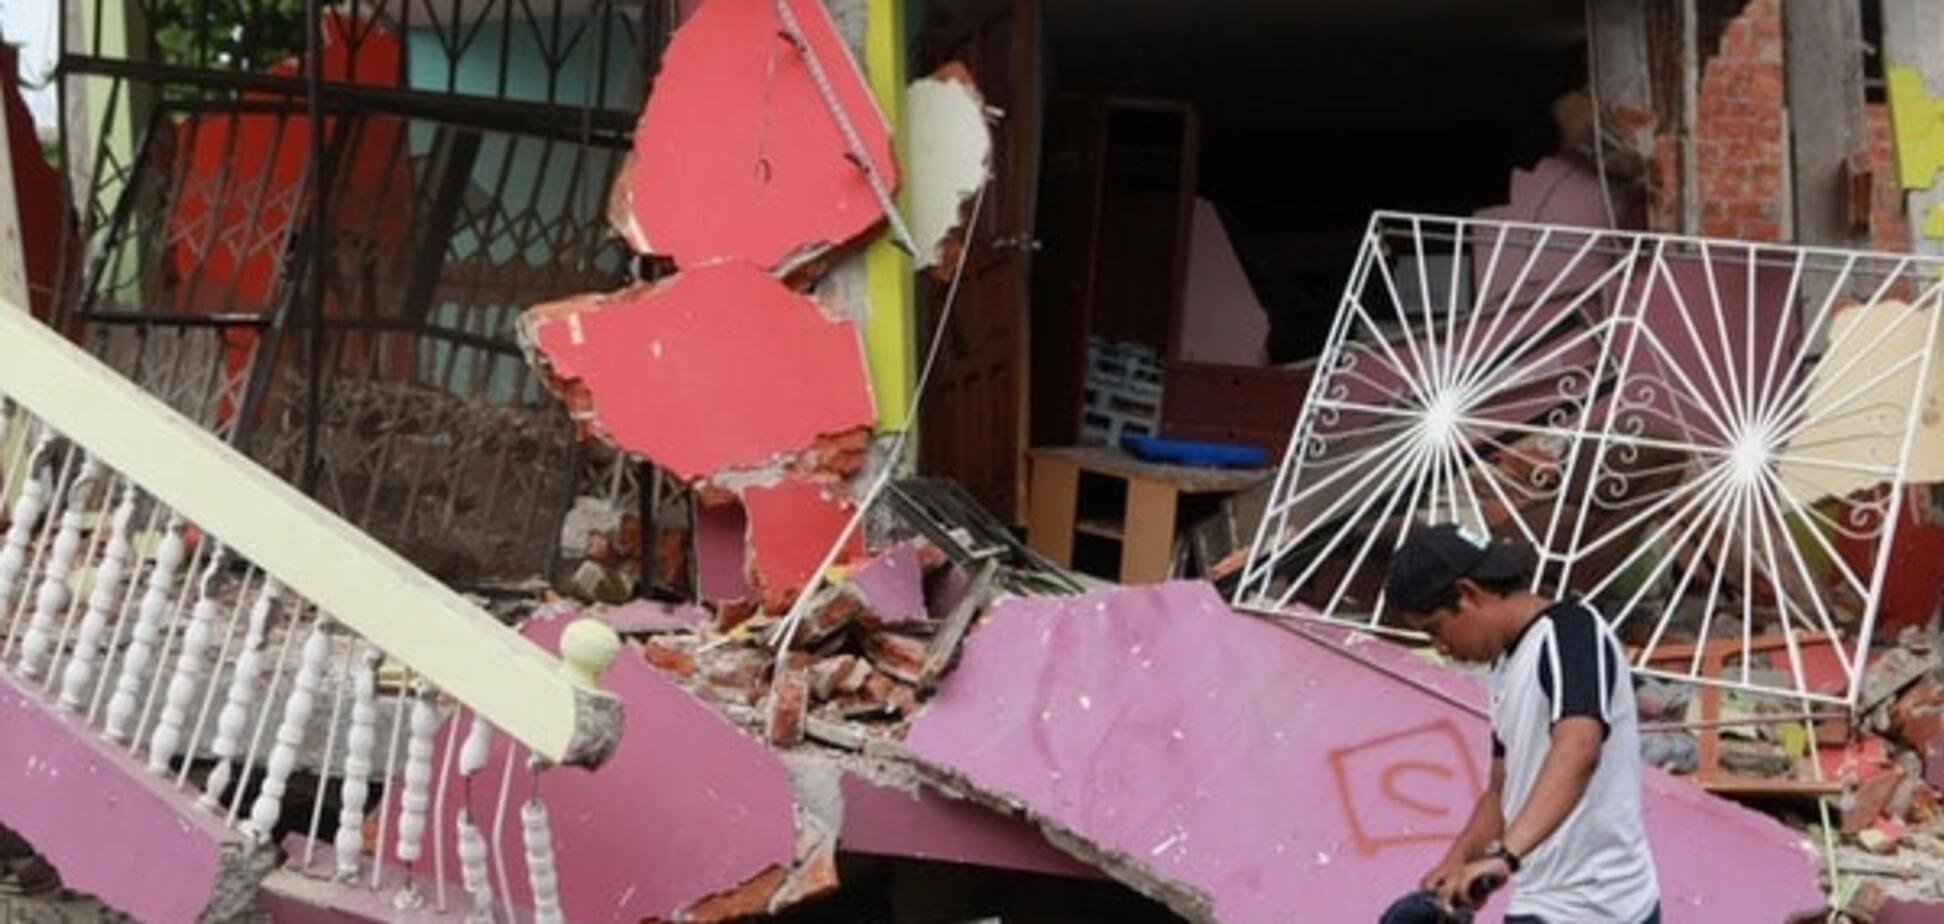 Катастрофа в Еквадорі: країну вразив черговий землетрус